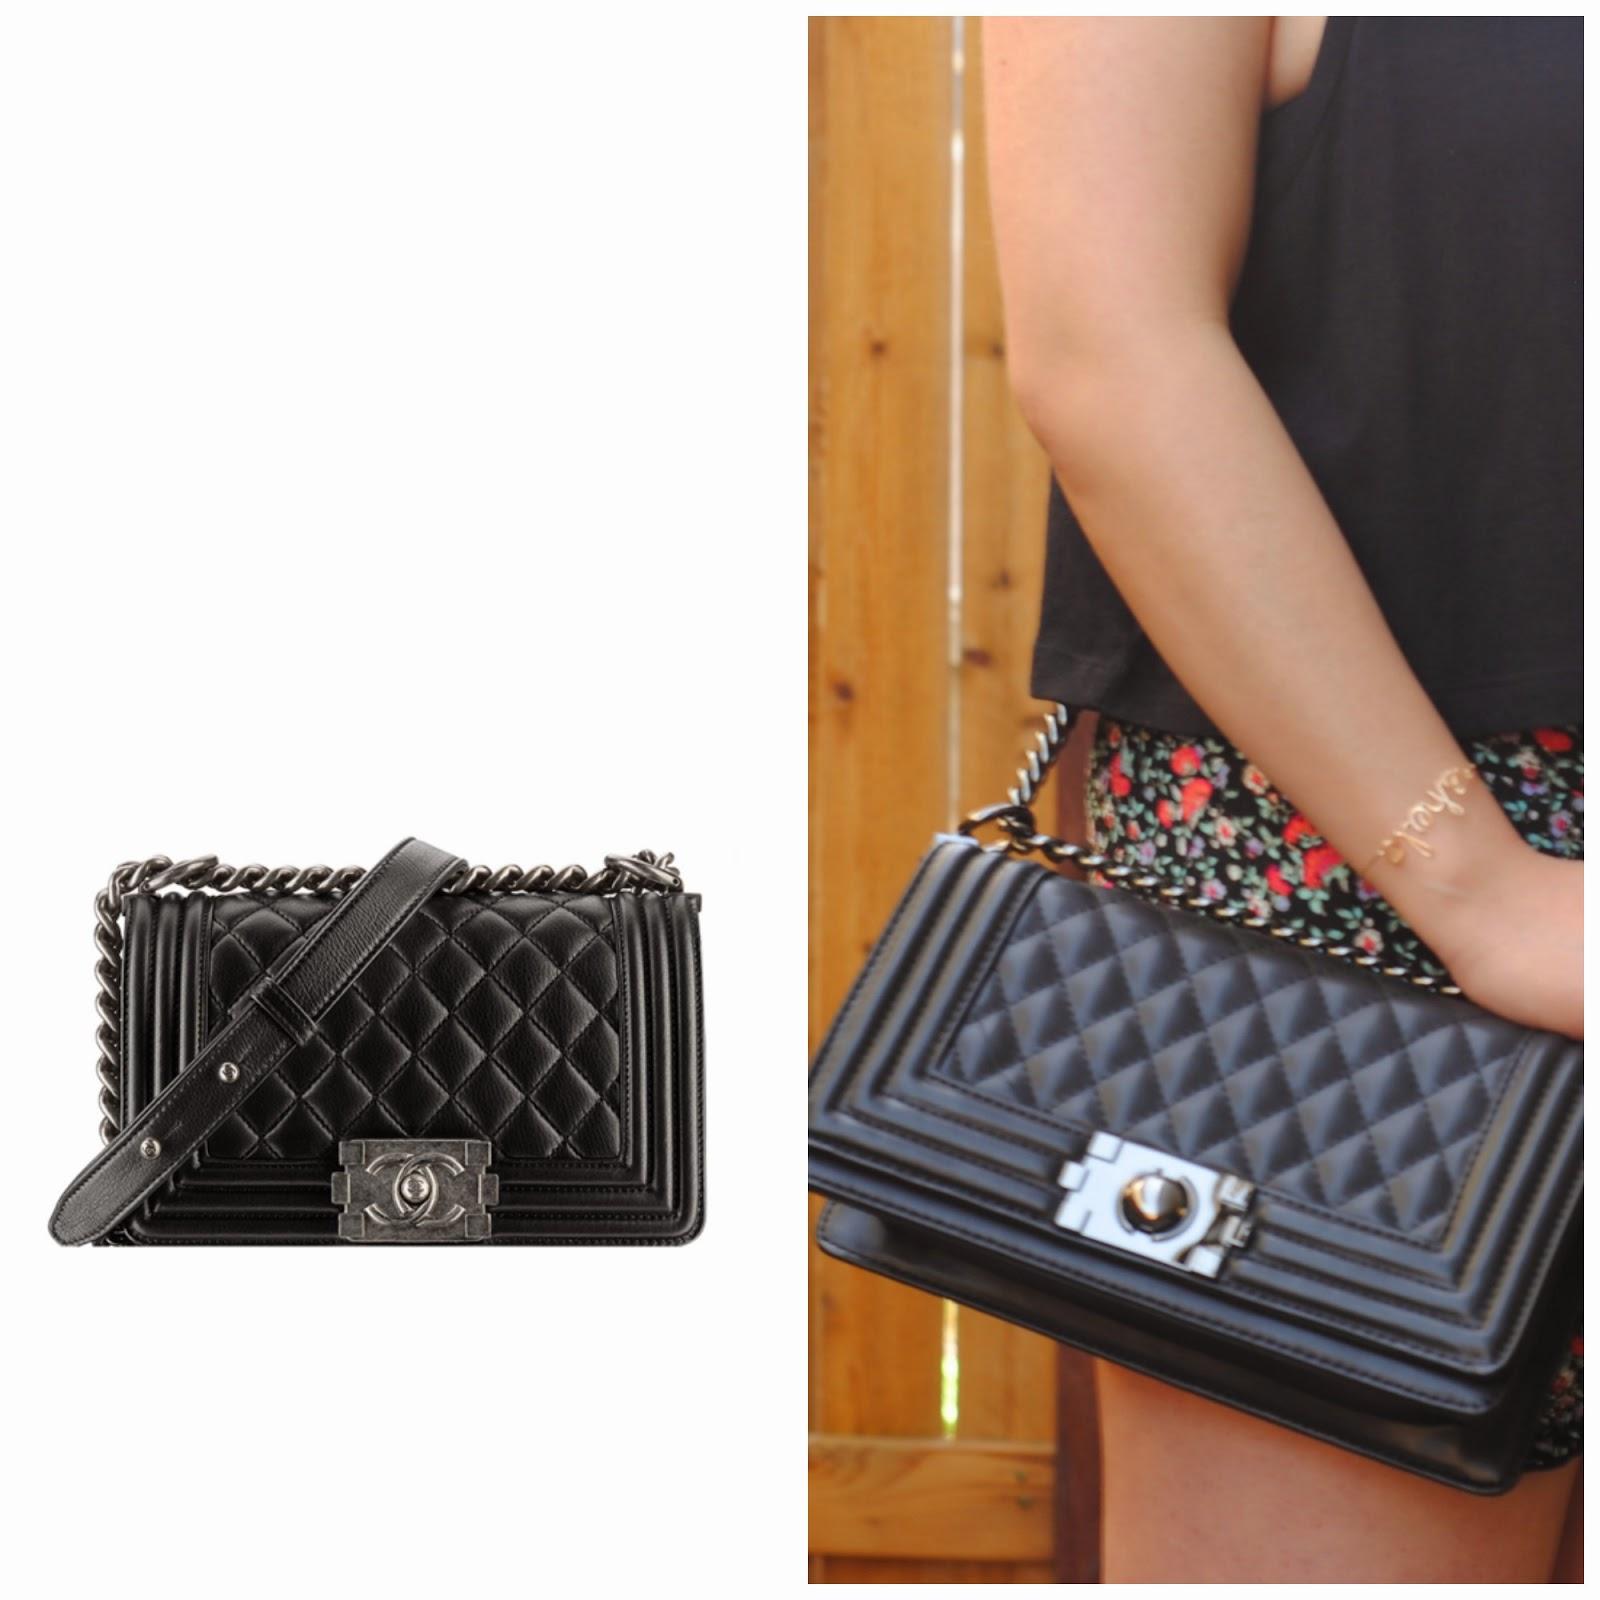 6ec12826a3c176 She is Lovely: Splurge vs Save: Chanel Boy